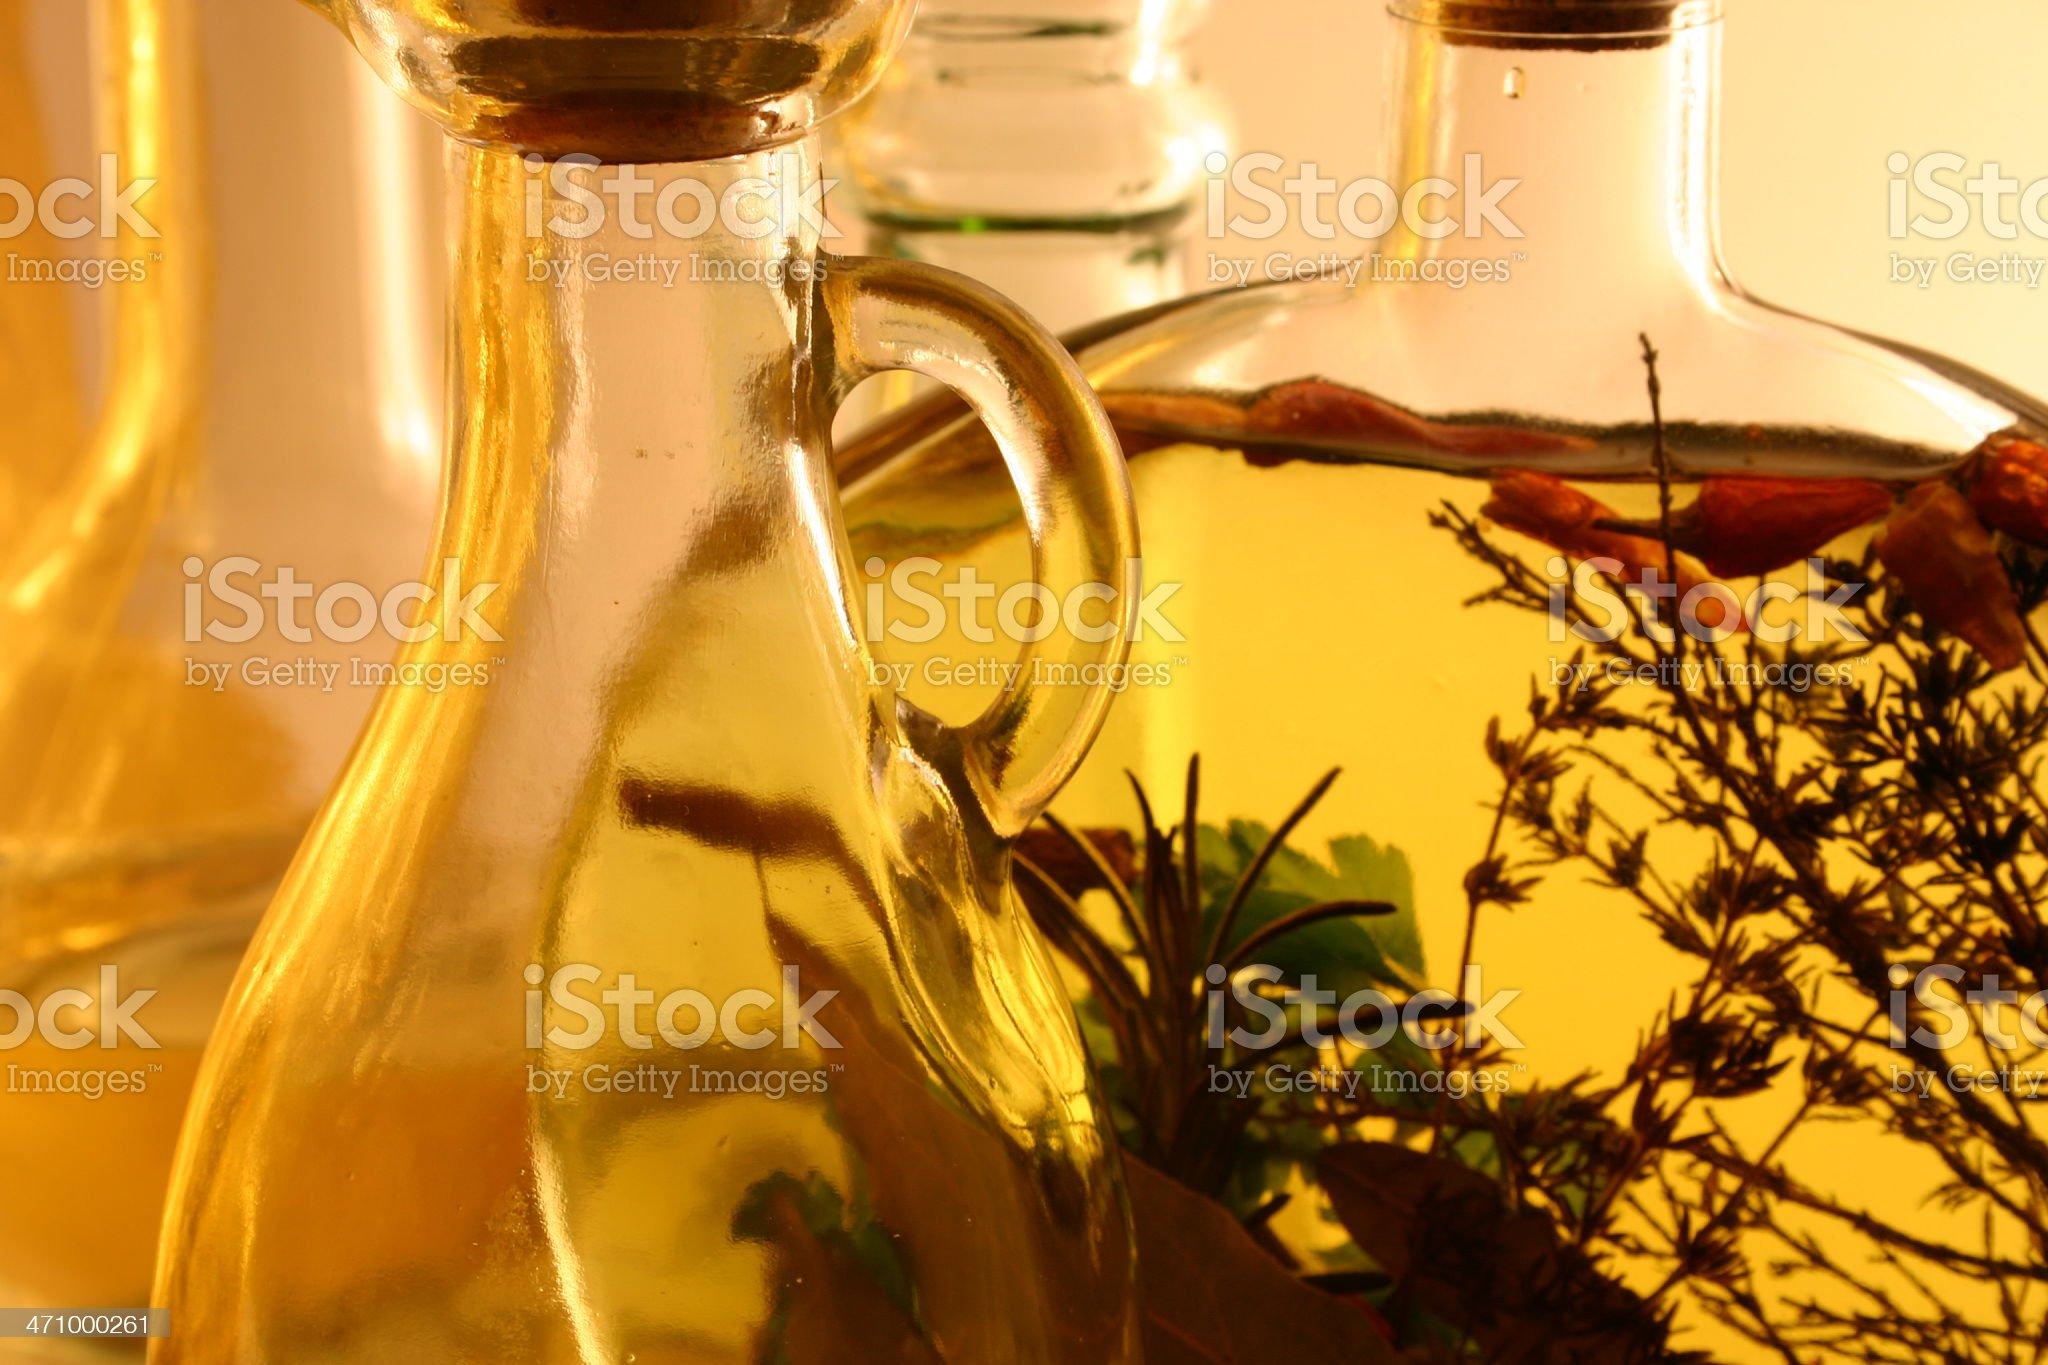 Bottles 3 royalty-free stock photo